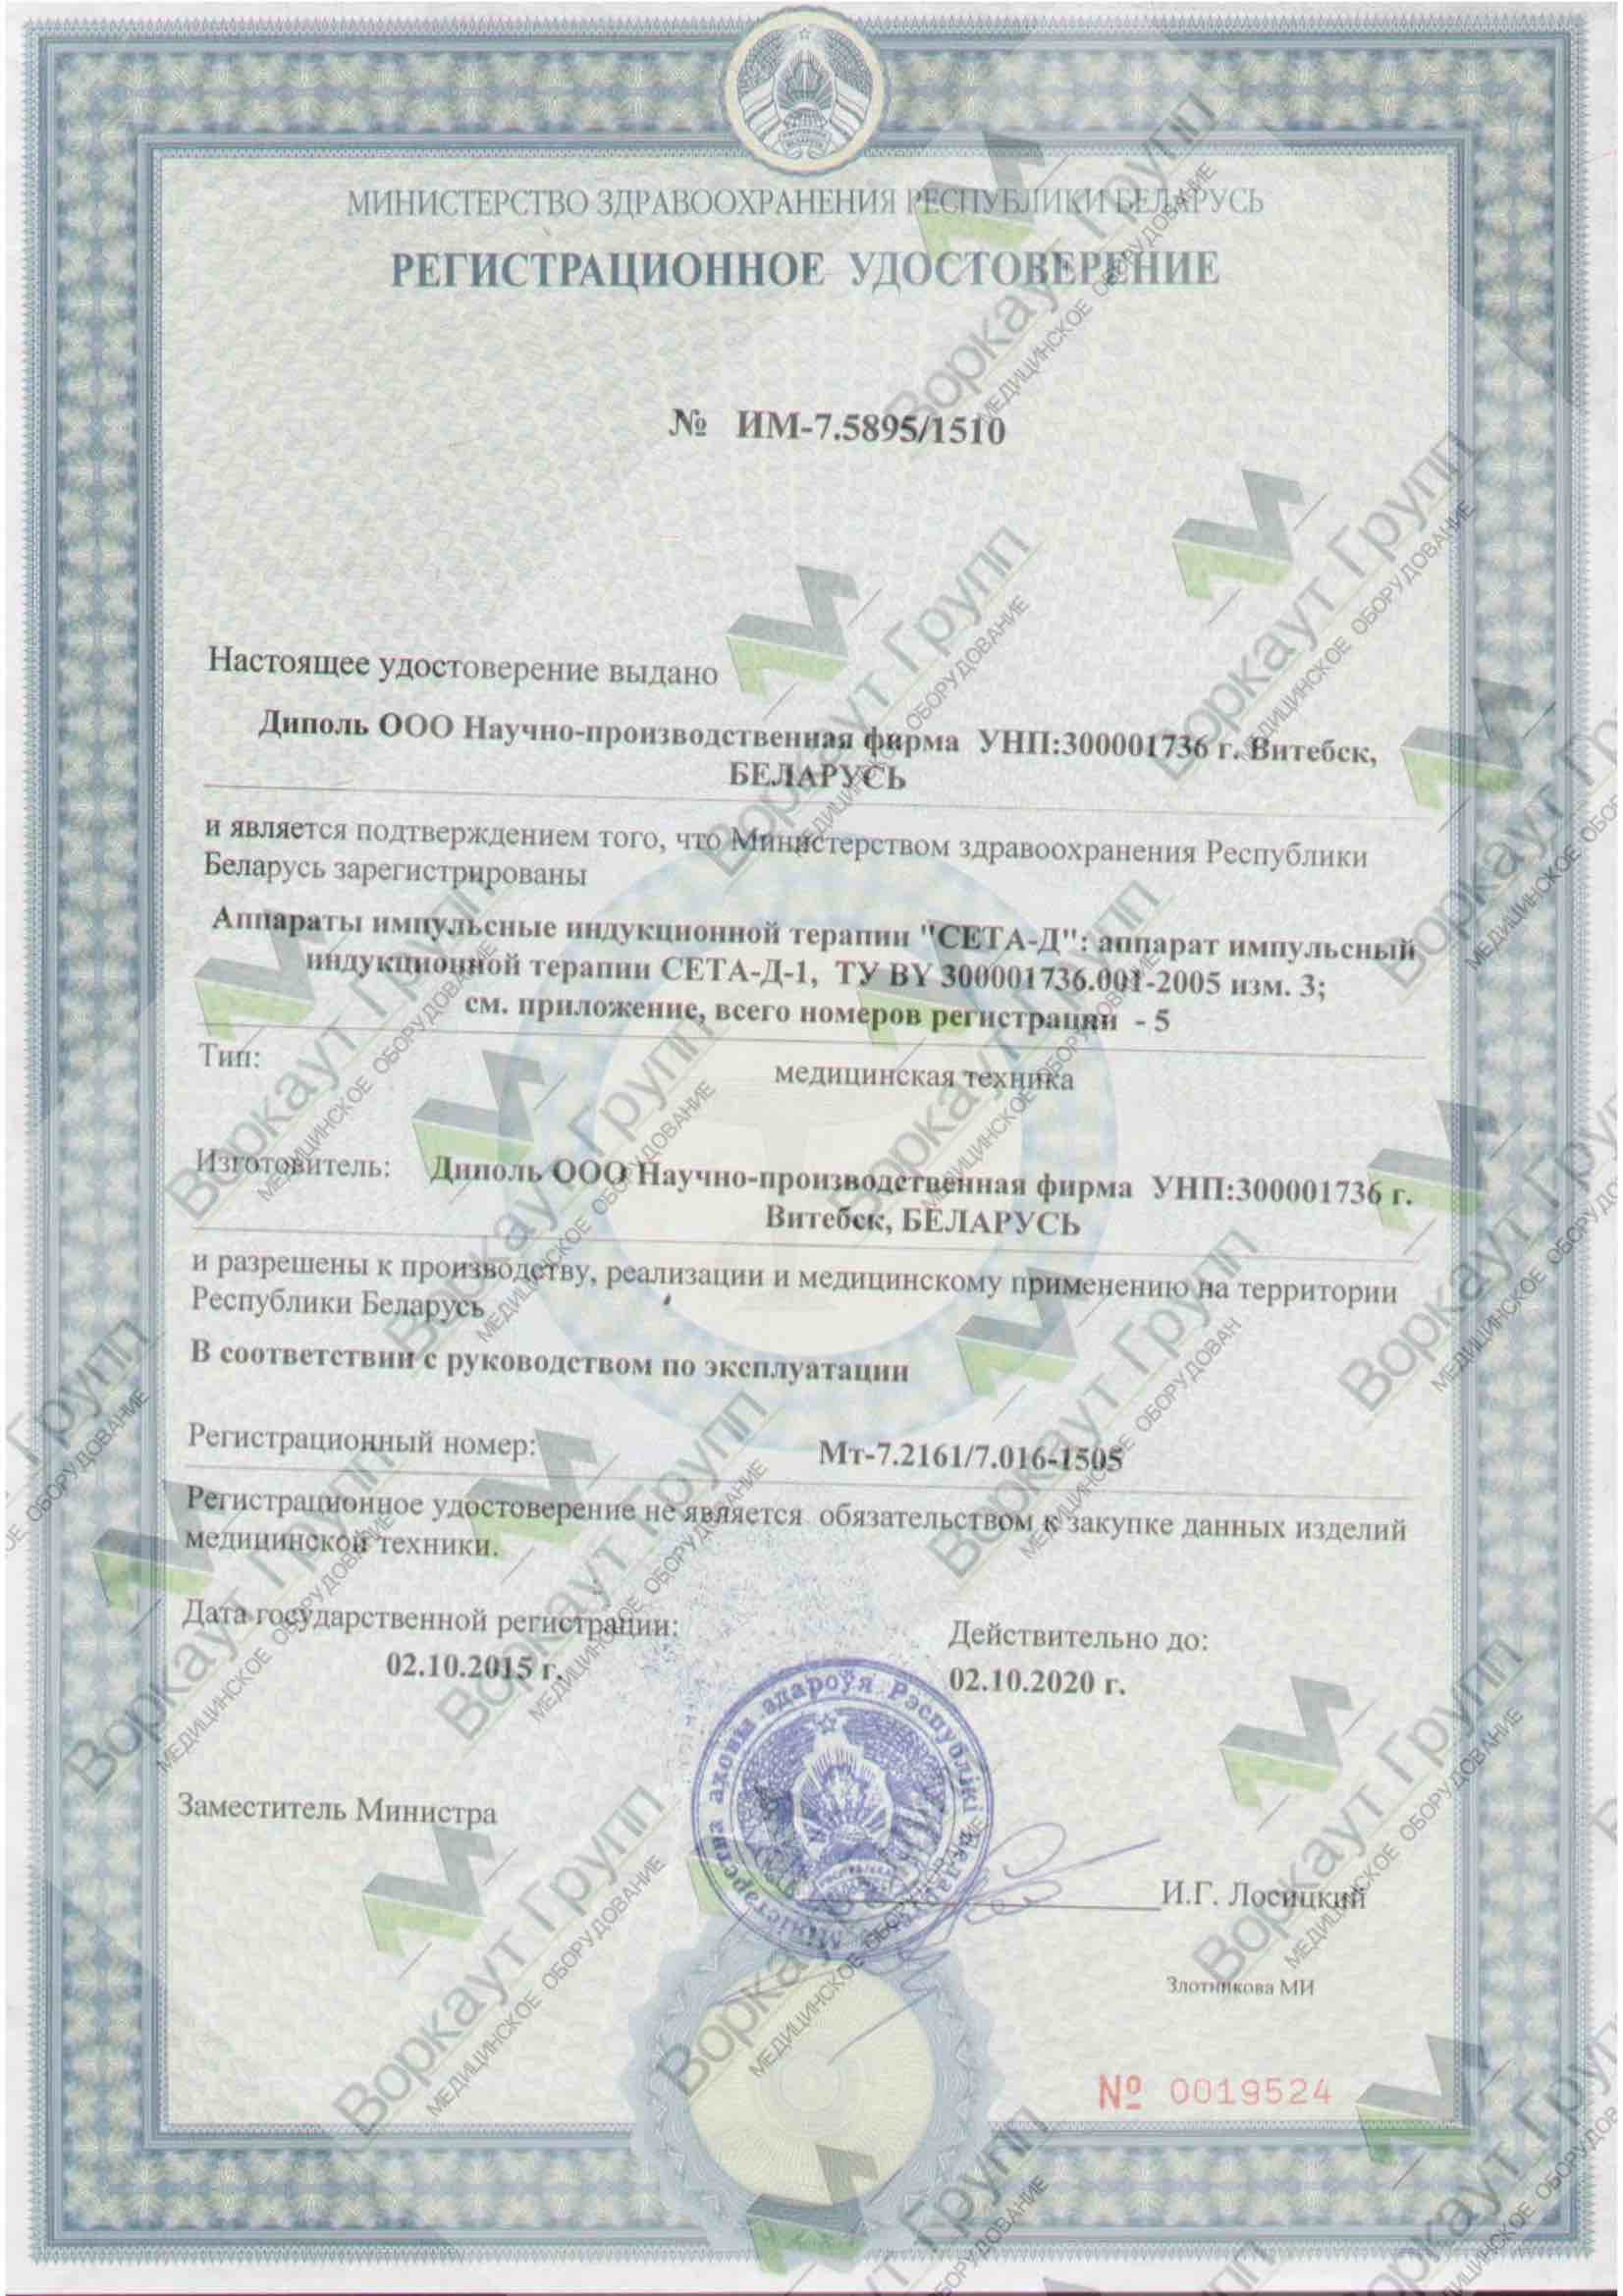 Аппарат СЕТА-Д-1